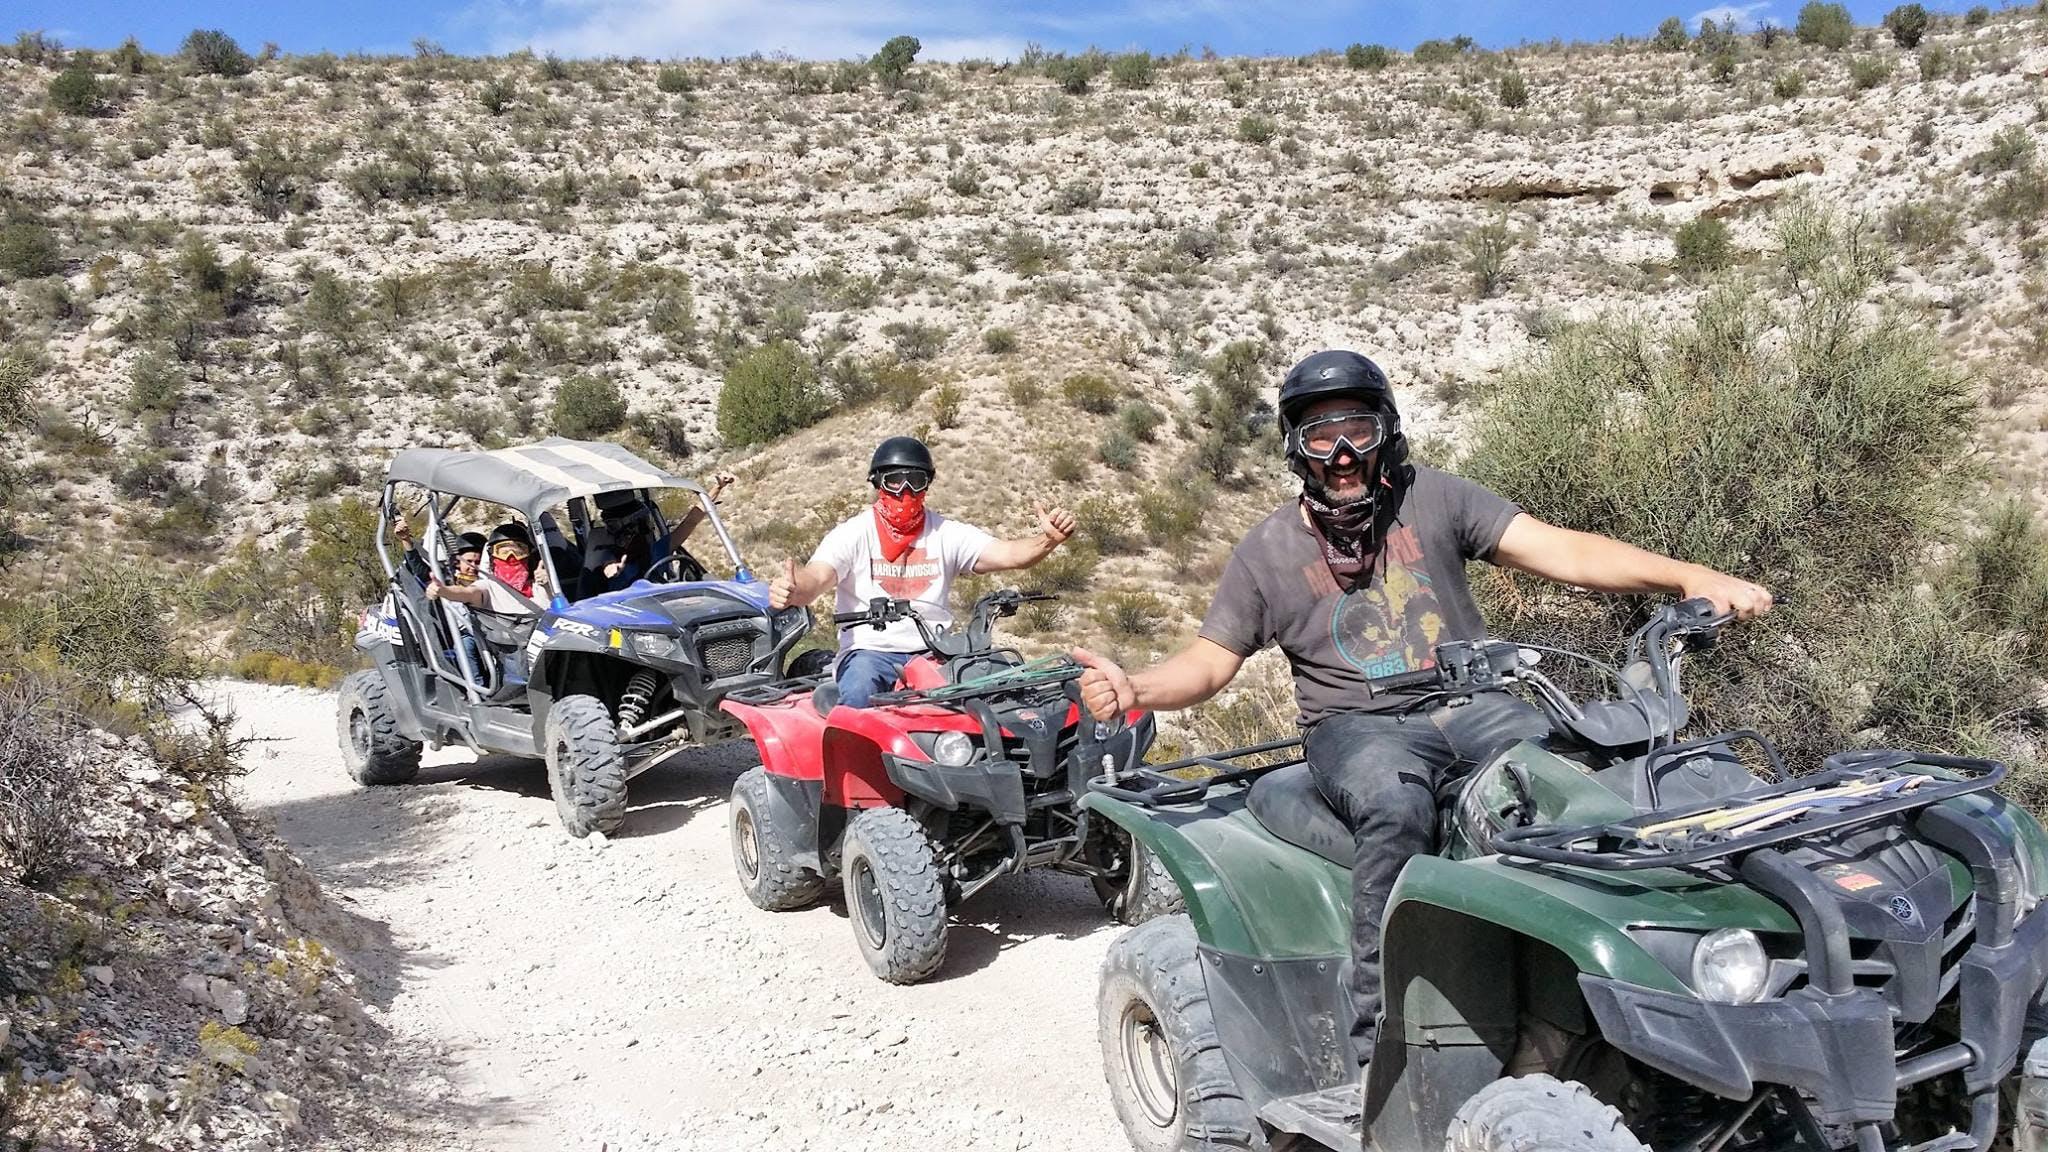 Arizona ATV Ride